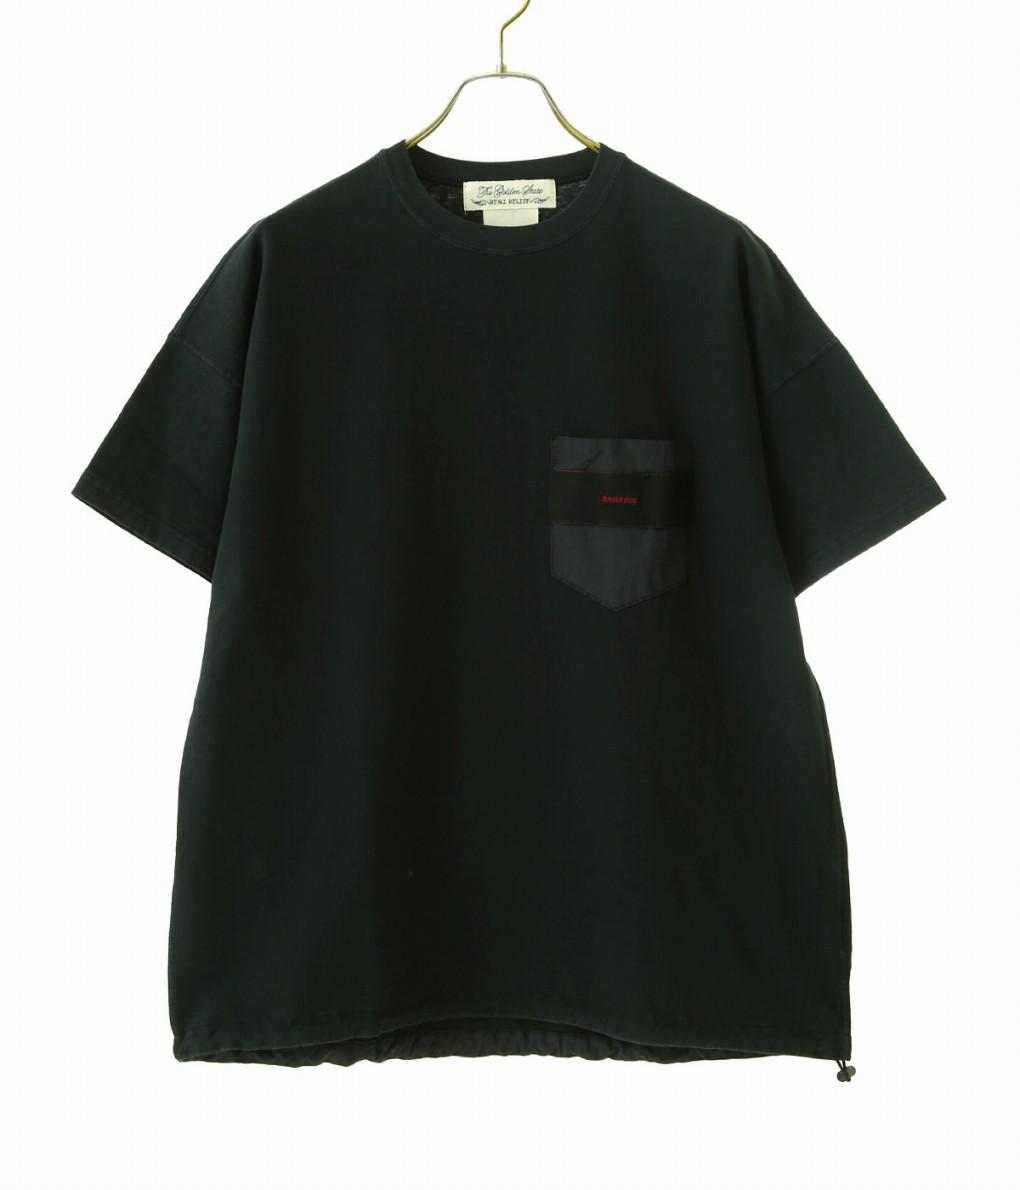 REMI RELIEF / レミレリーフ : BRIEFING1 / 全2色 : カットソー ティーシャツ 半袖 ブリーフィング コラボ メンズ : RN18249171 【PIE】